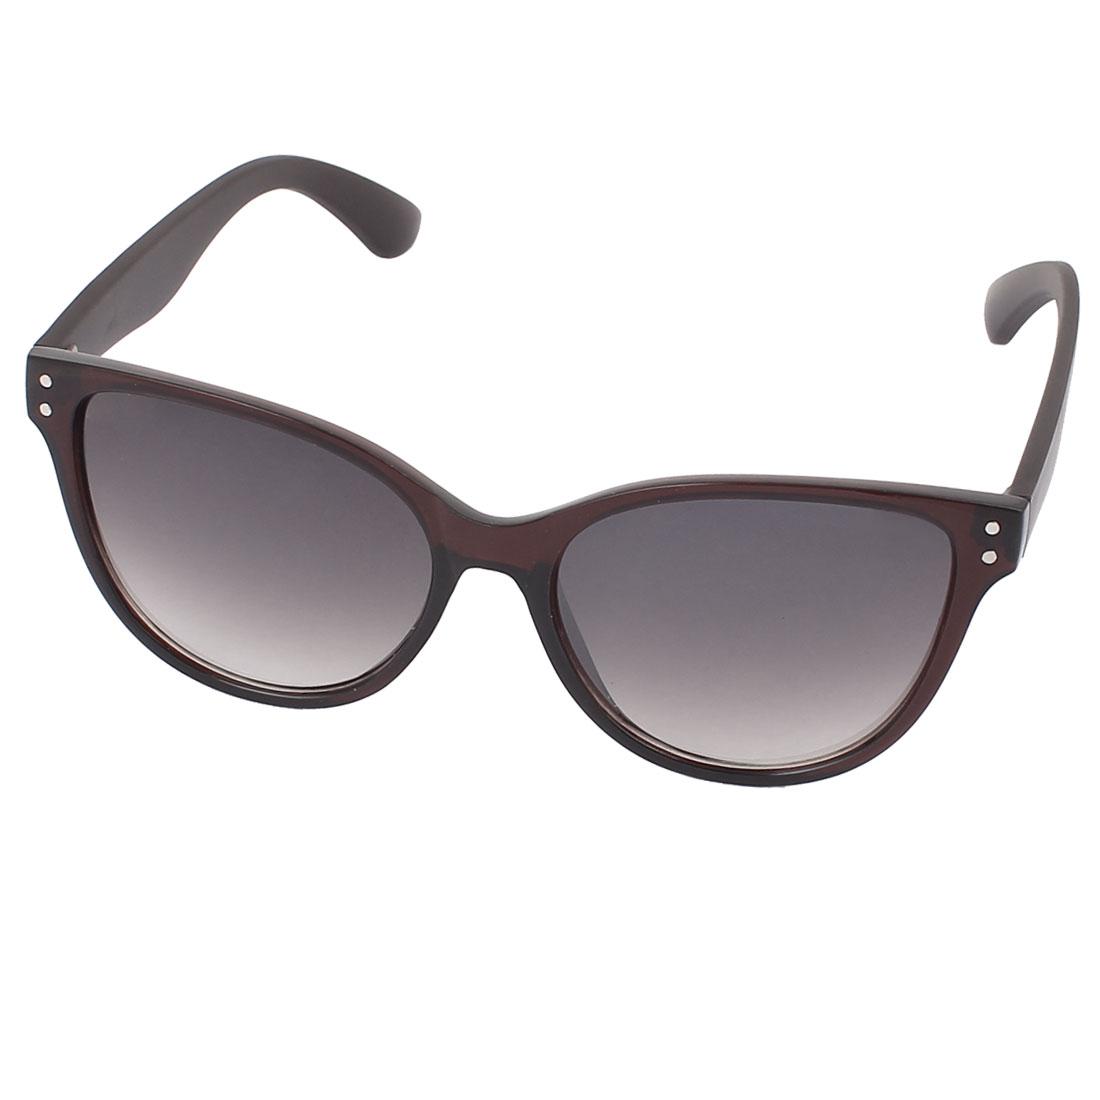 Unisex Coffee Color Plastic Full Rim Gradient Lens Single Bridge Sunglasses Eyeswear Glasses Eyes Protector